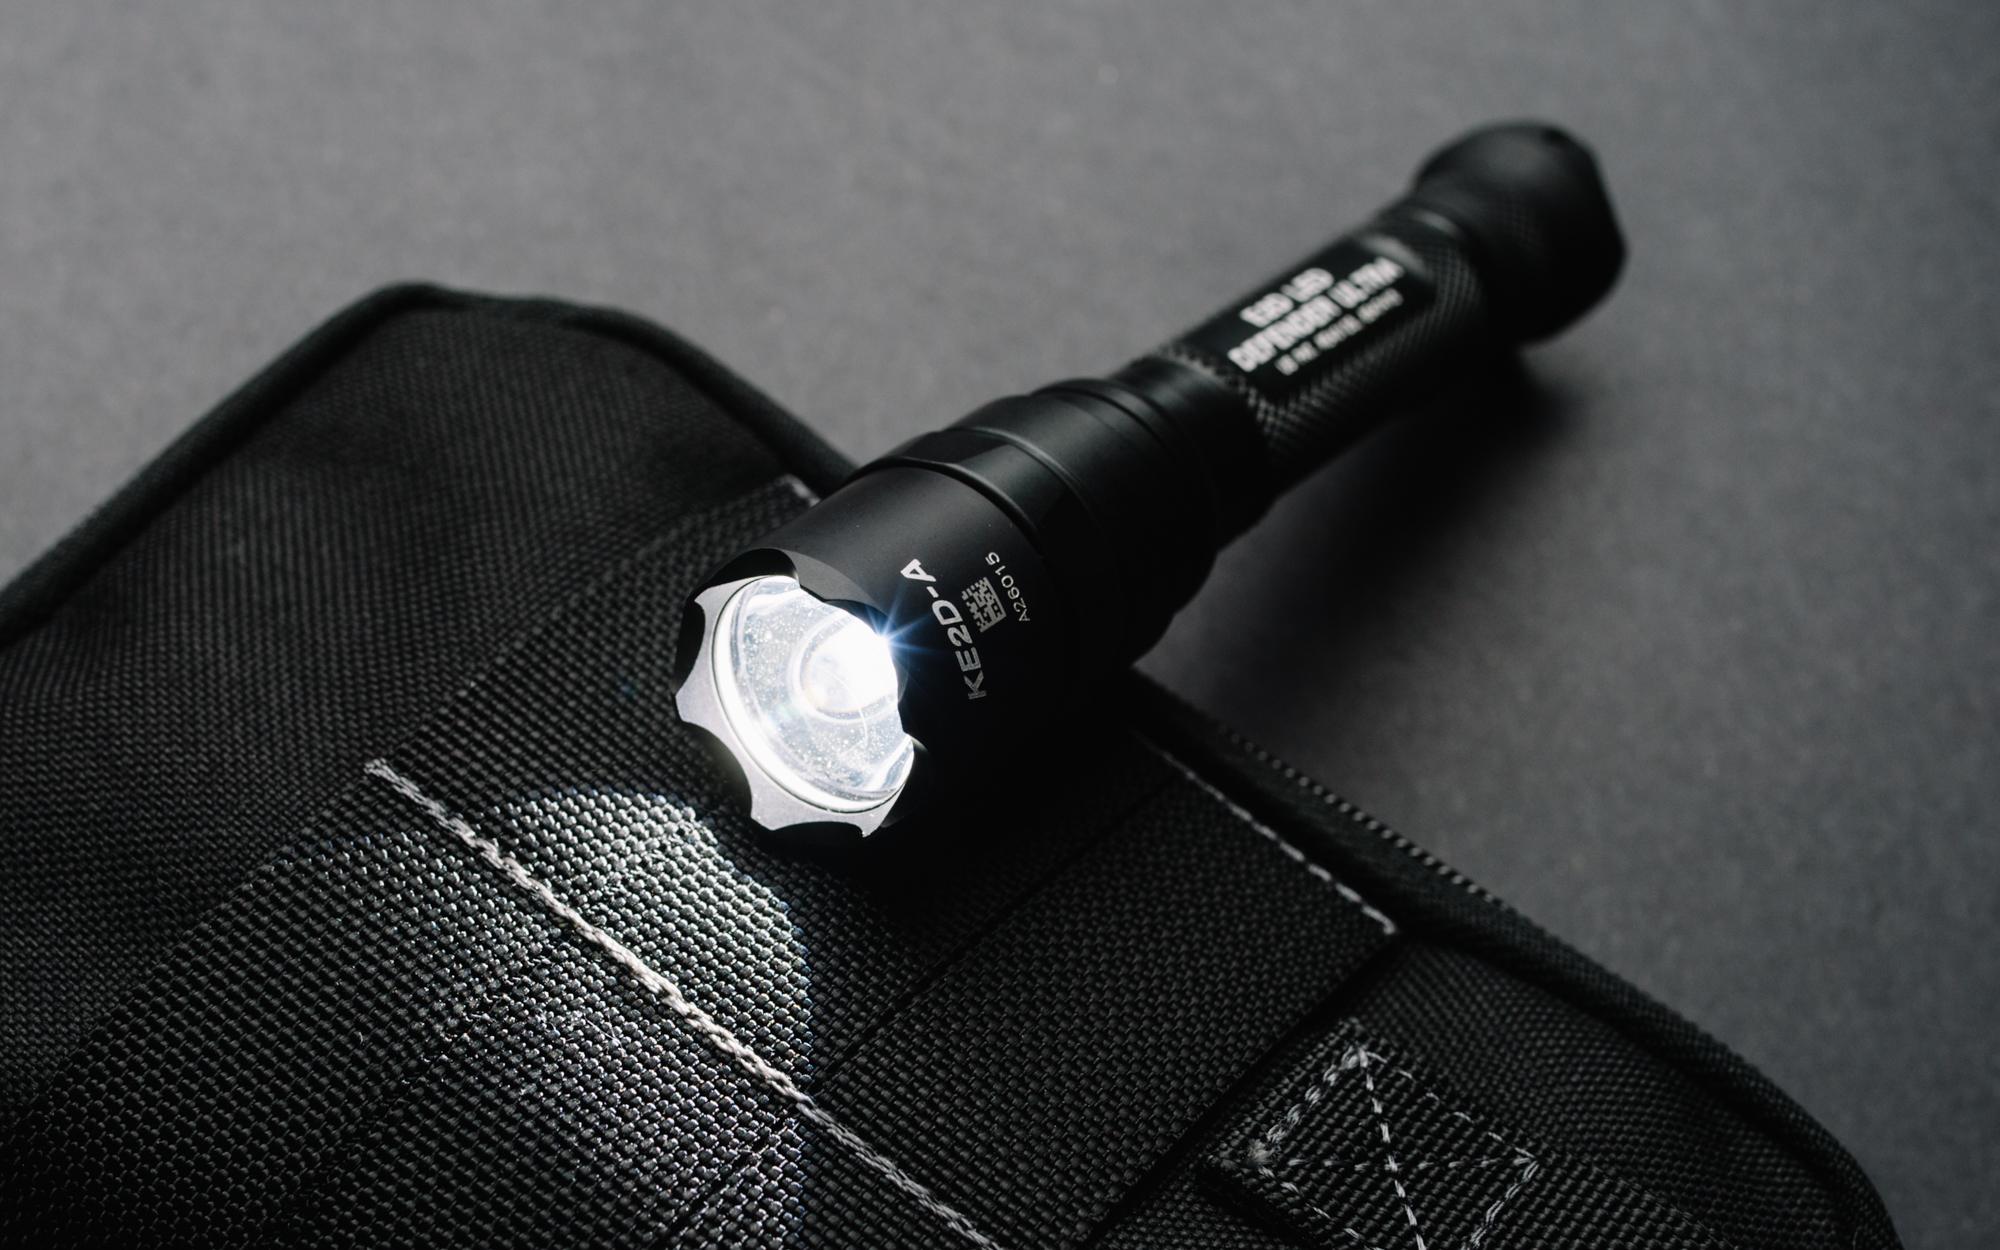 SureFire E2D LED Defender Ultra